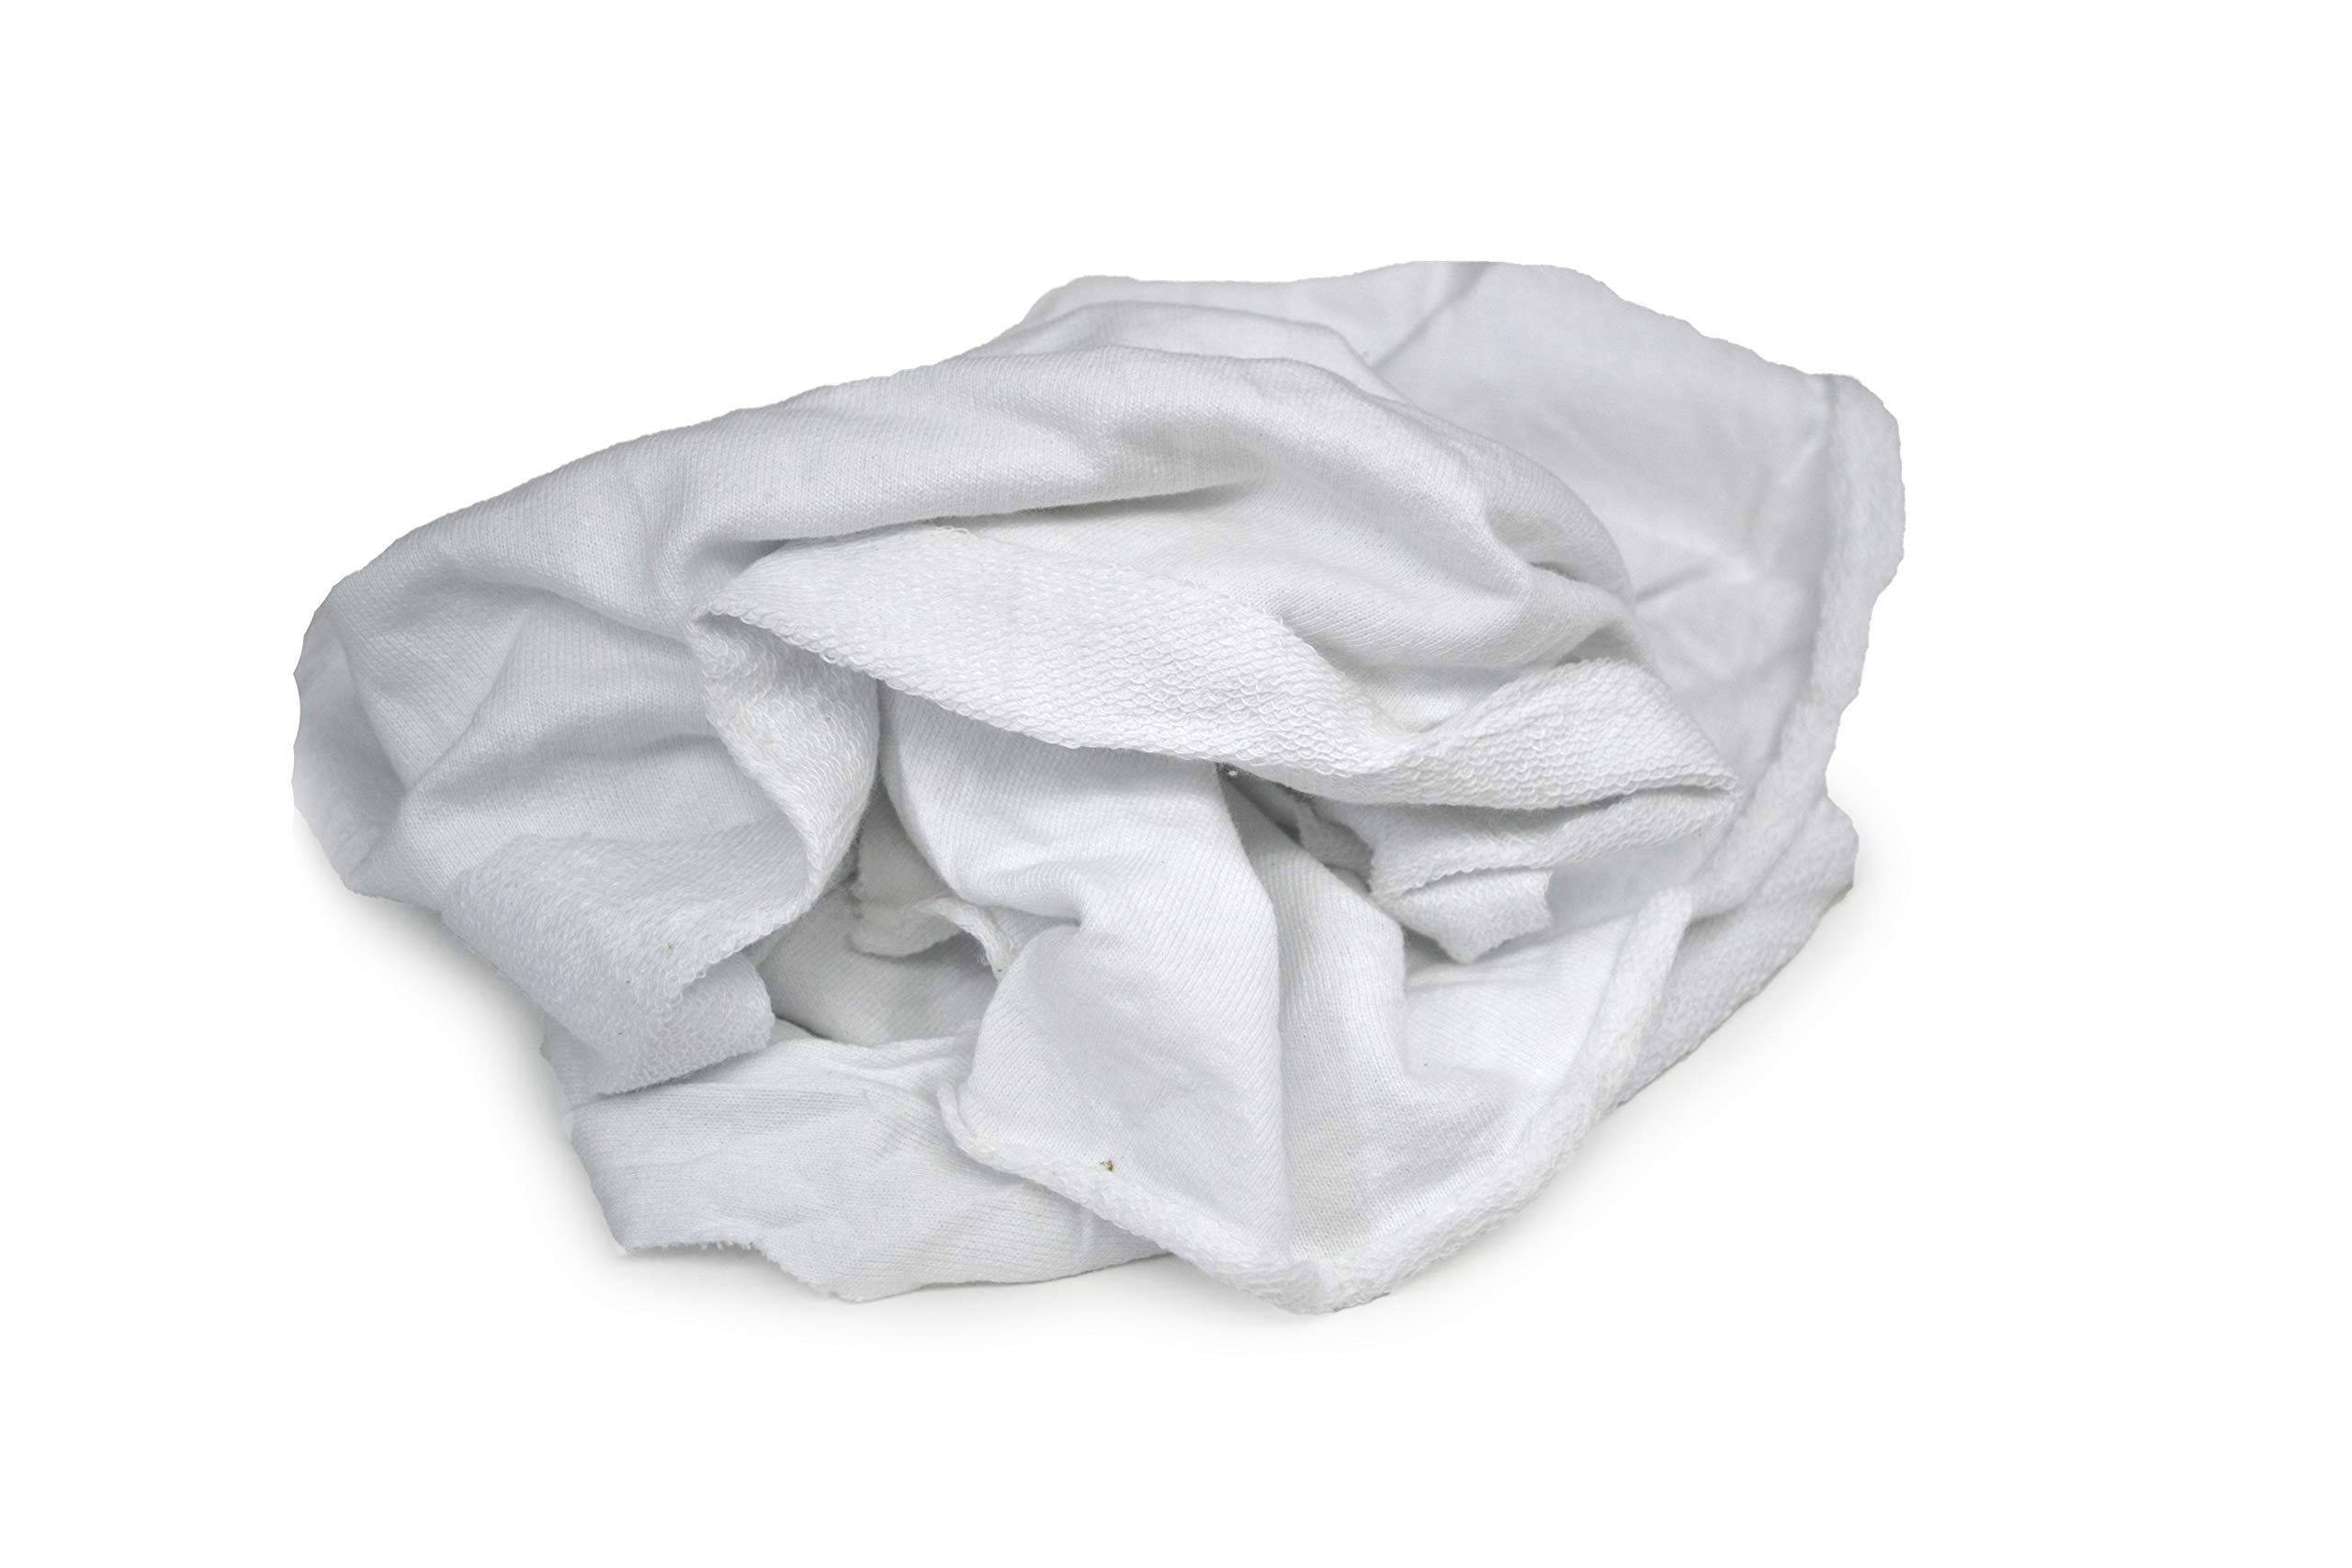 Tuf-Clean 99302 T-Shirt Knit Rags, 100% Cotton, White, 50 lb Box by Tuf-Clean (Image #2)